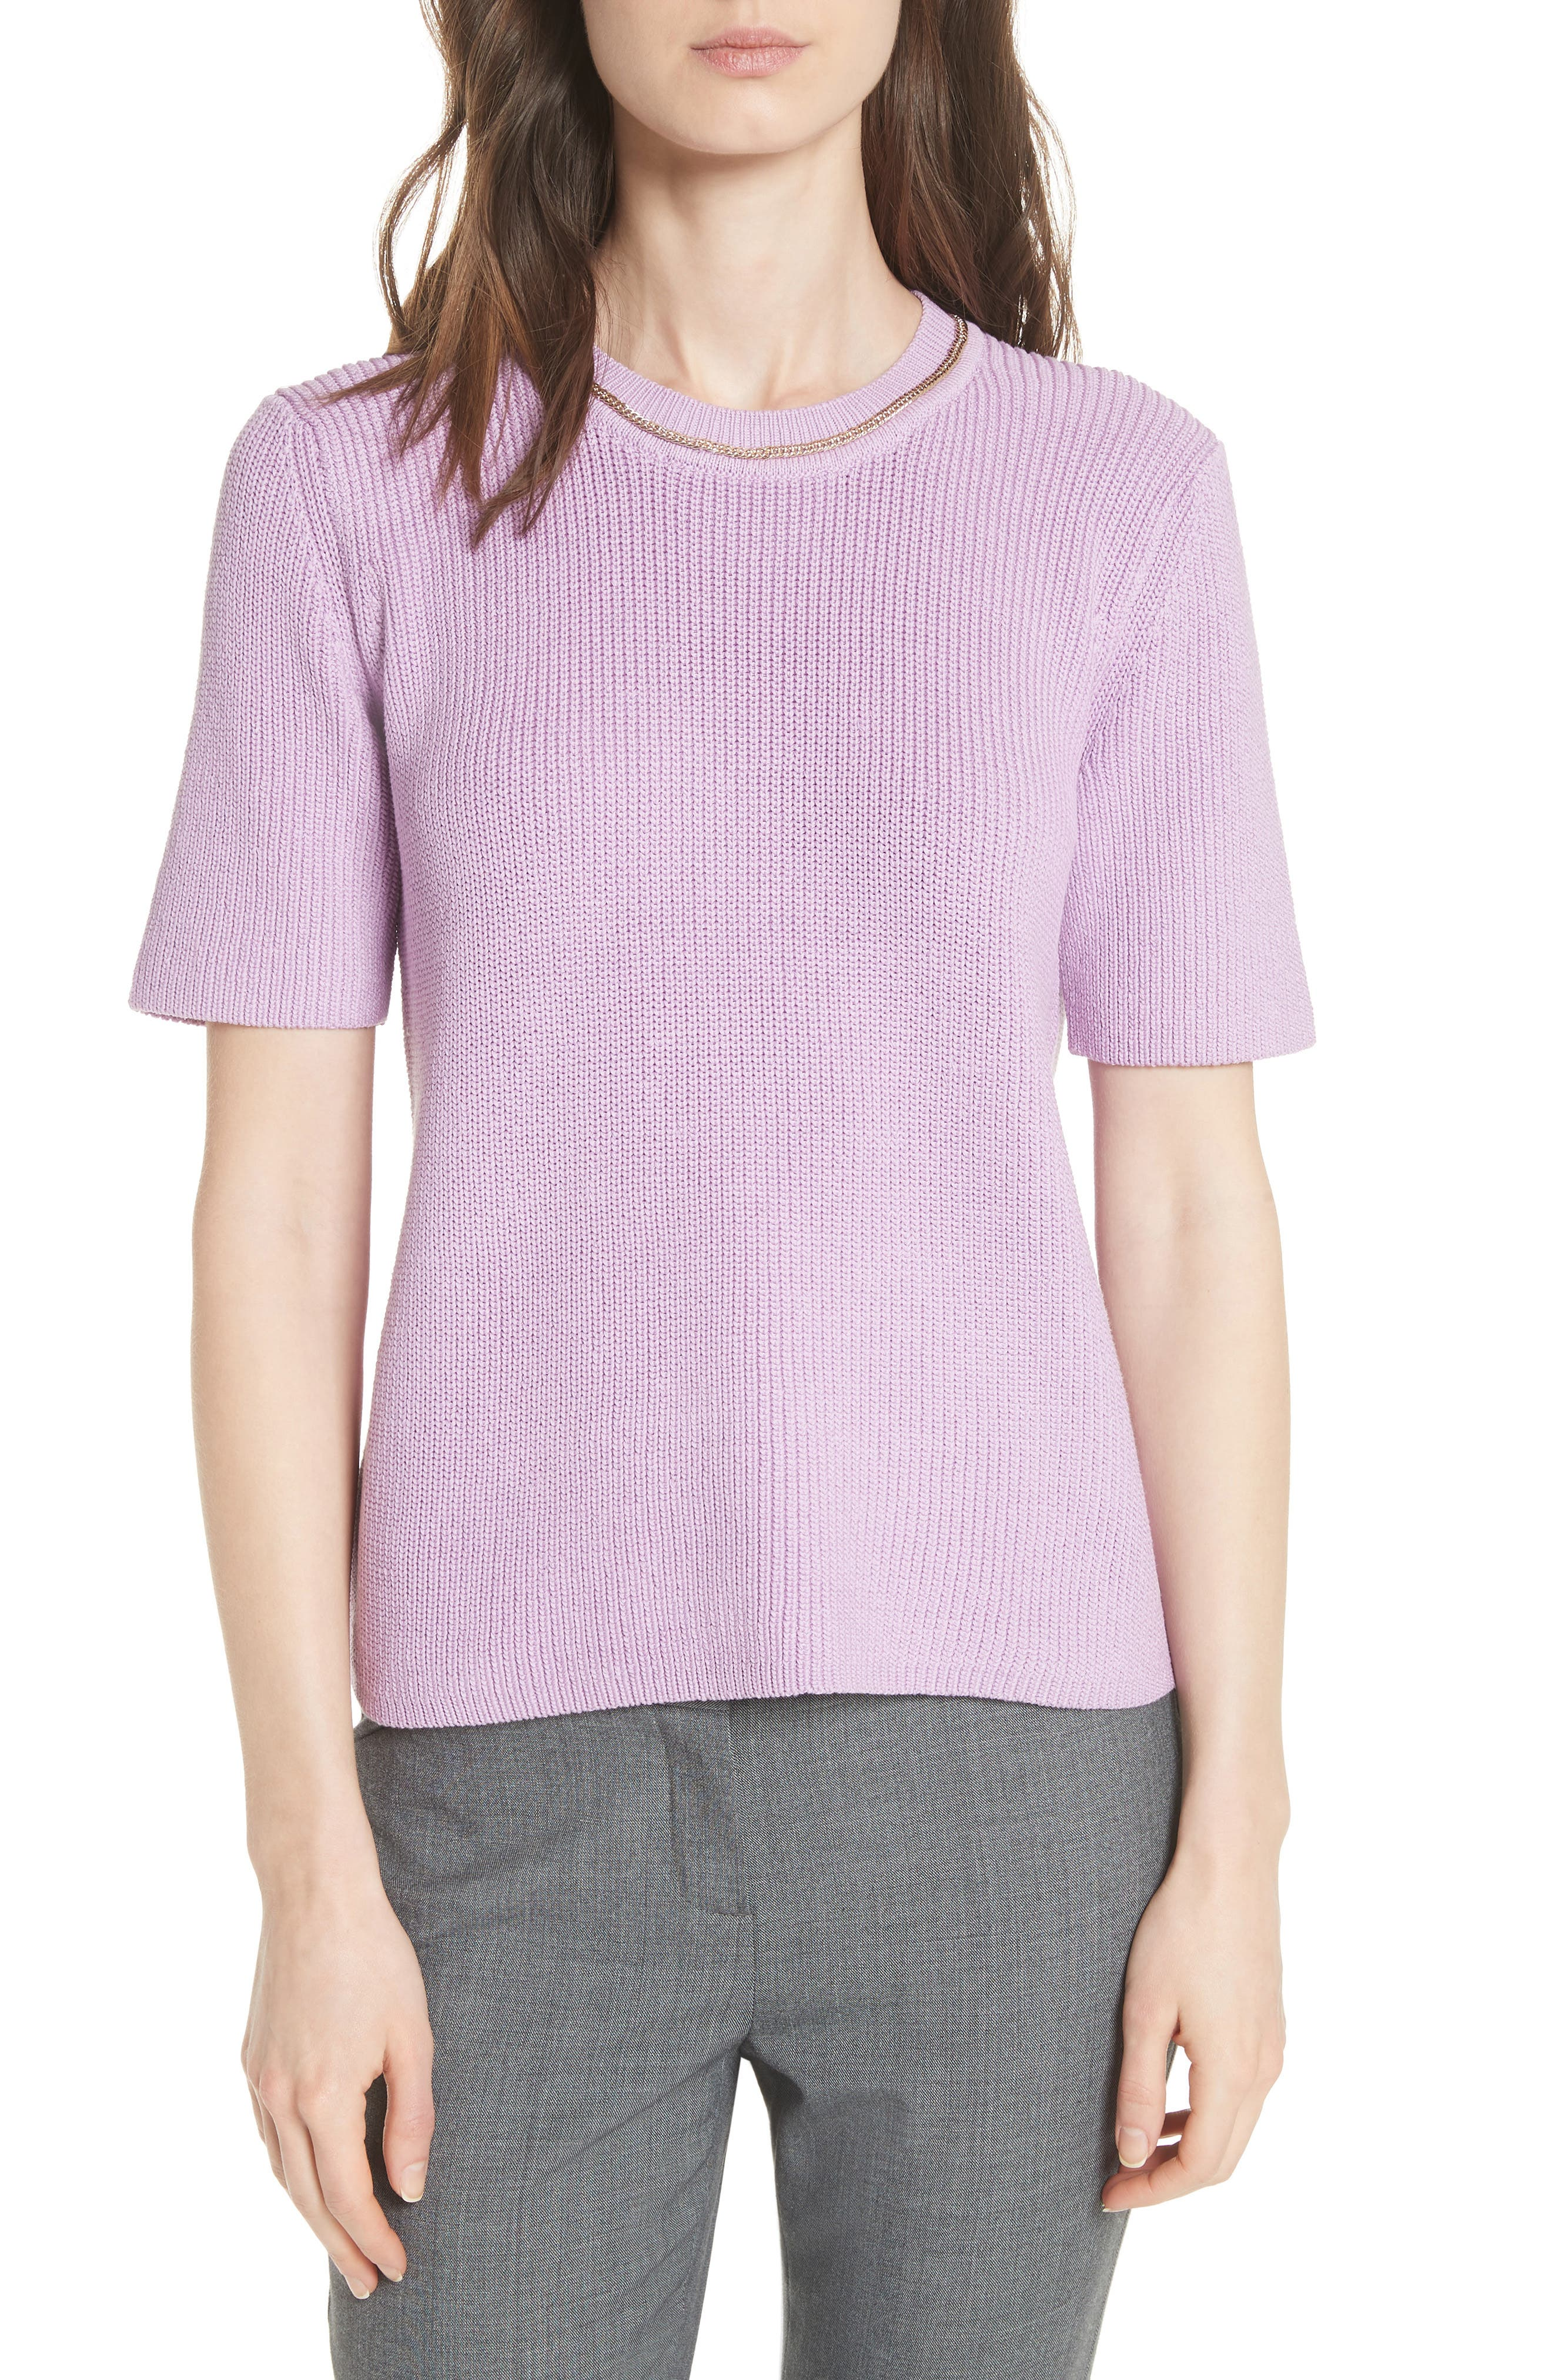 Magrite Sweater,                             Main thumbnail 1, color,                             Lilas